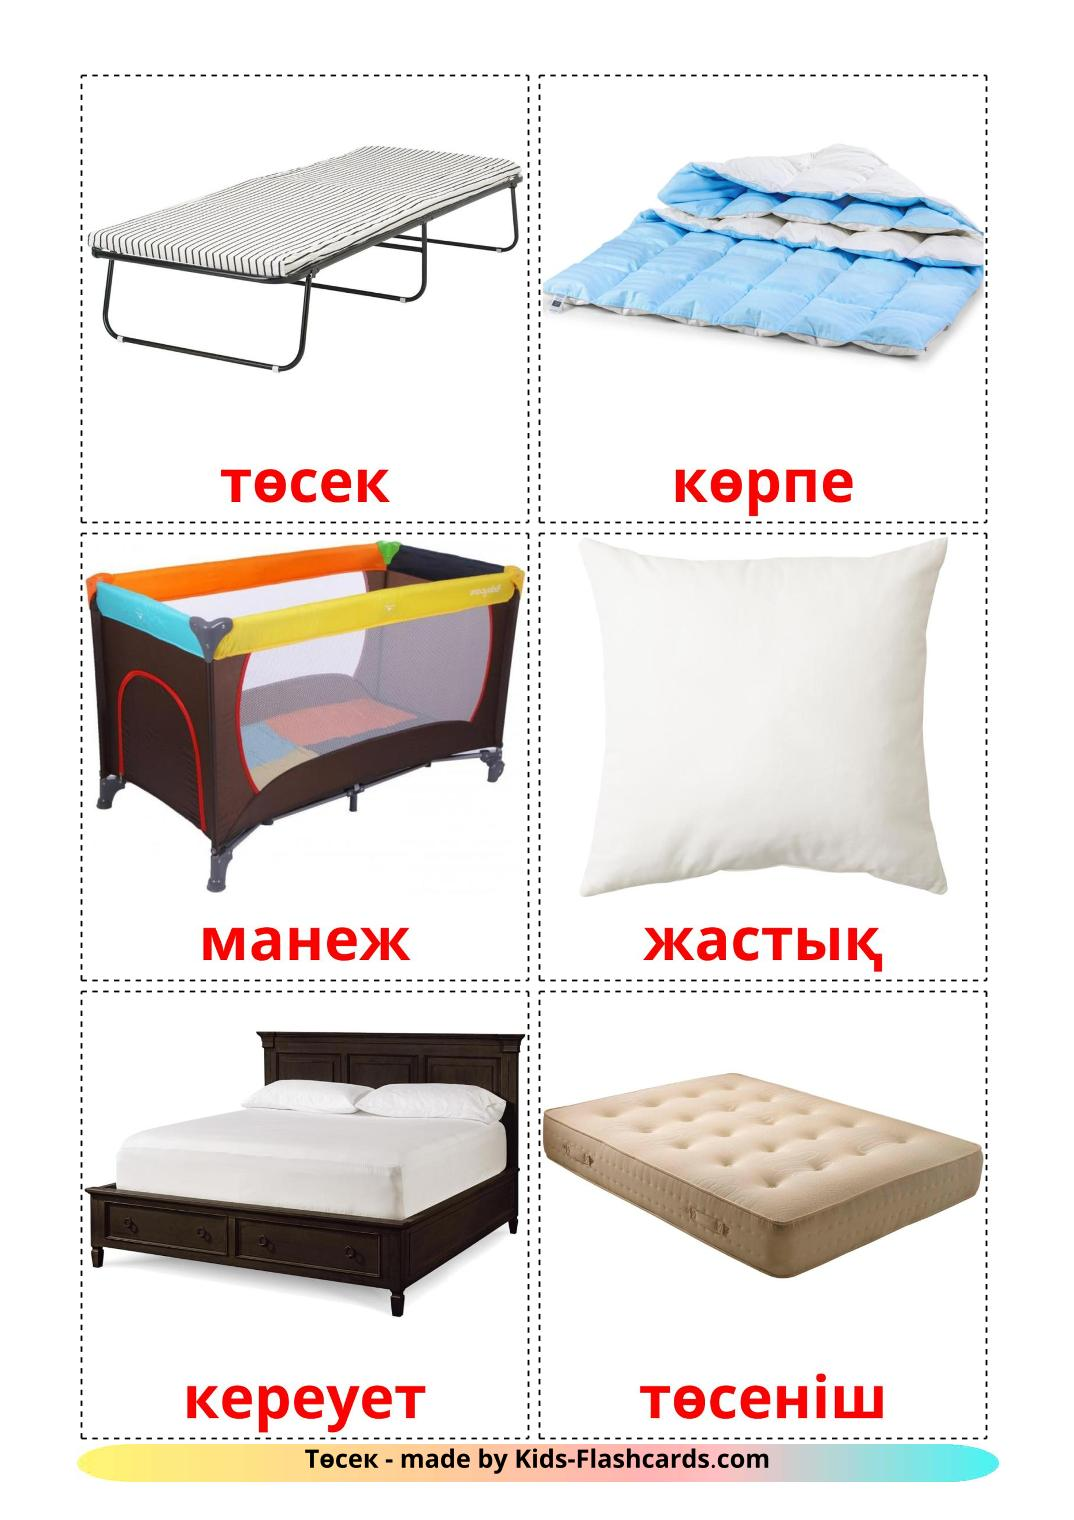 Bed - 15 Free Printable kazakh Flashcards